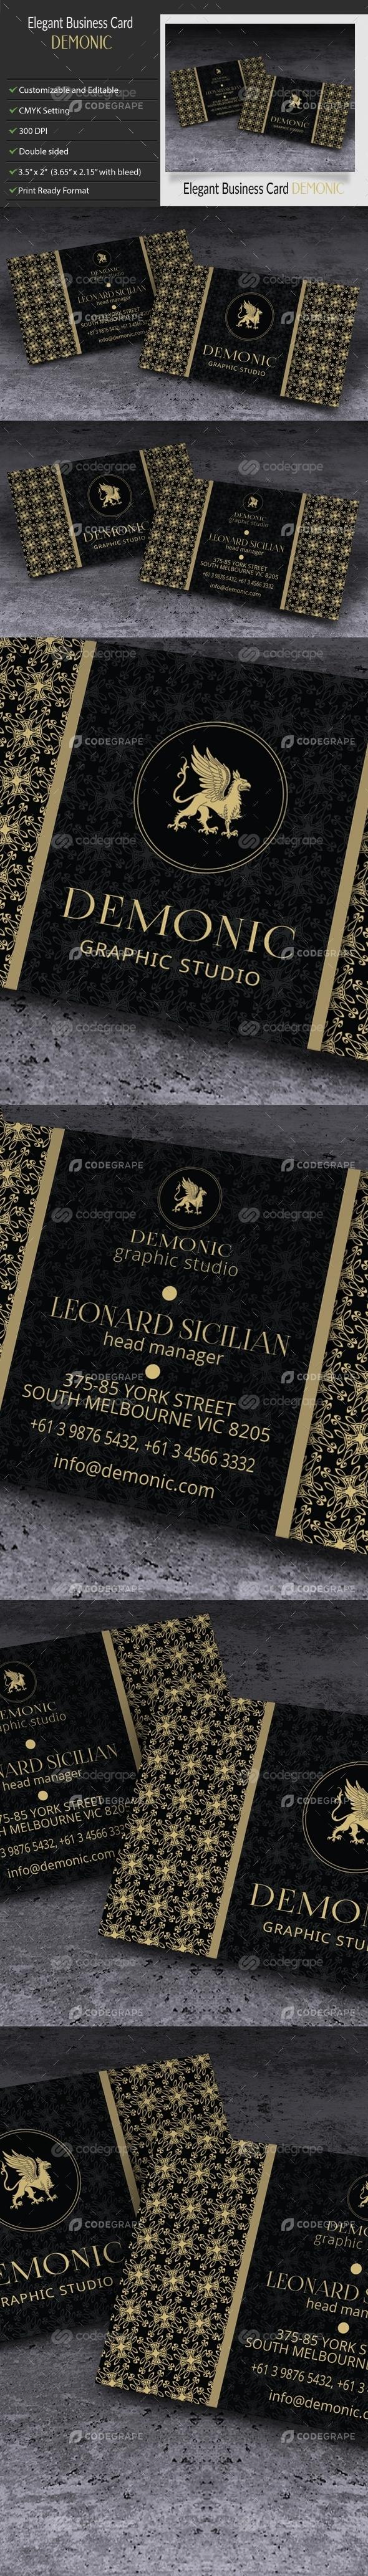 Elegant Creative Business Card - Demonic